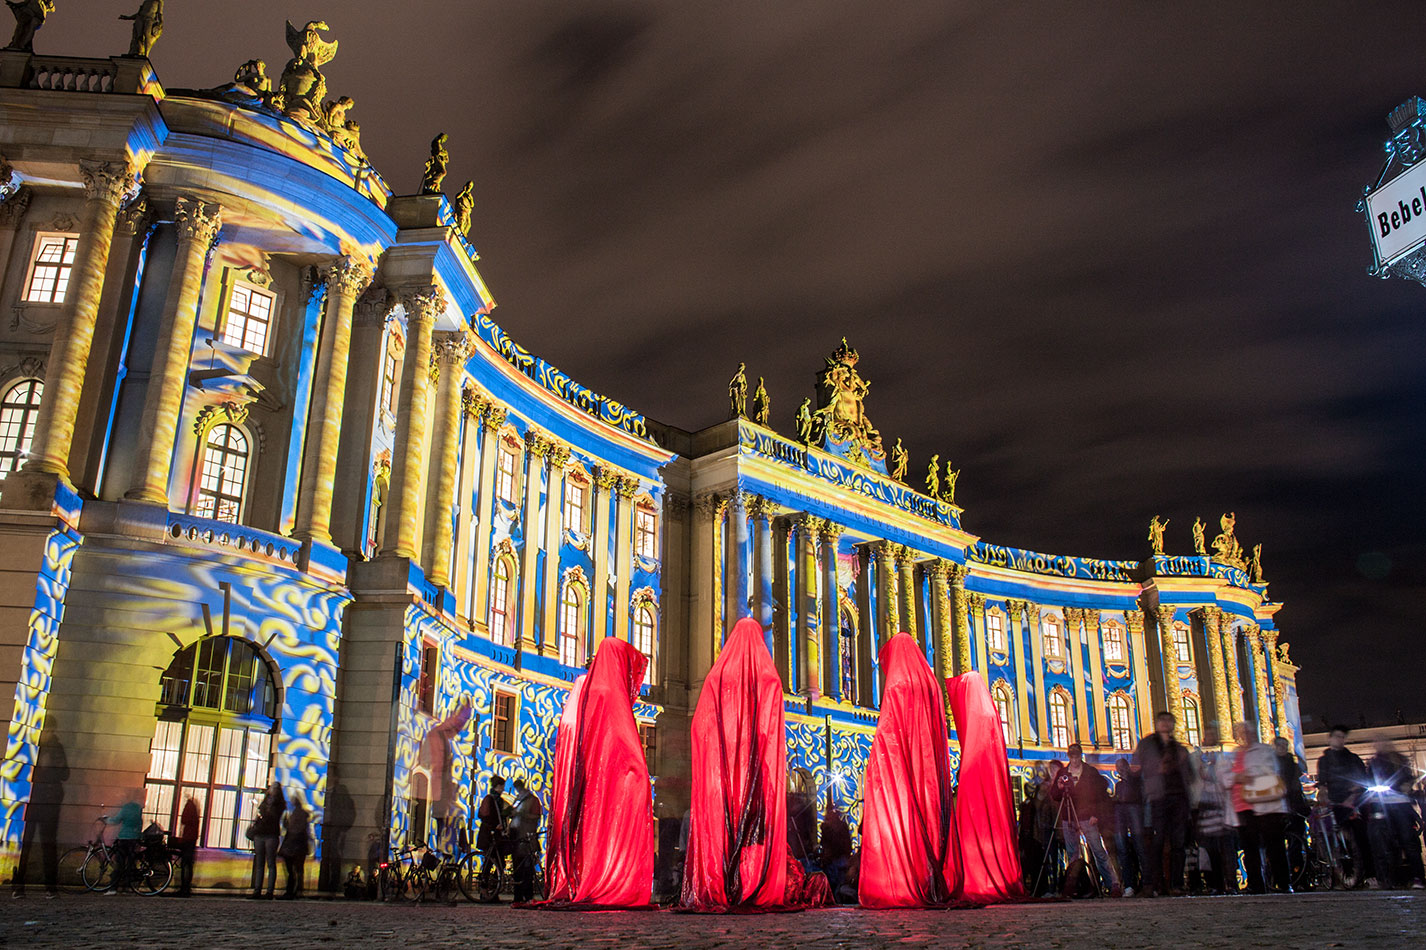 festival-of-lights-berlin-humboldt-university-light-art-show-exhibition-lumina-guardians-of-time-manfred-kili-kielnhofer-contemporary-arts-design-sculpture-3407